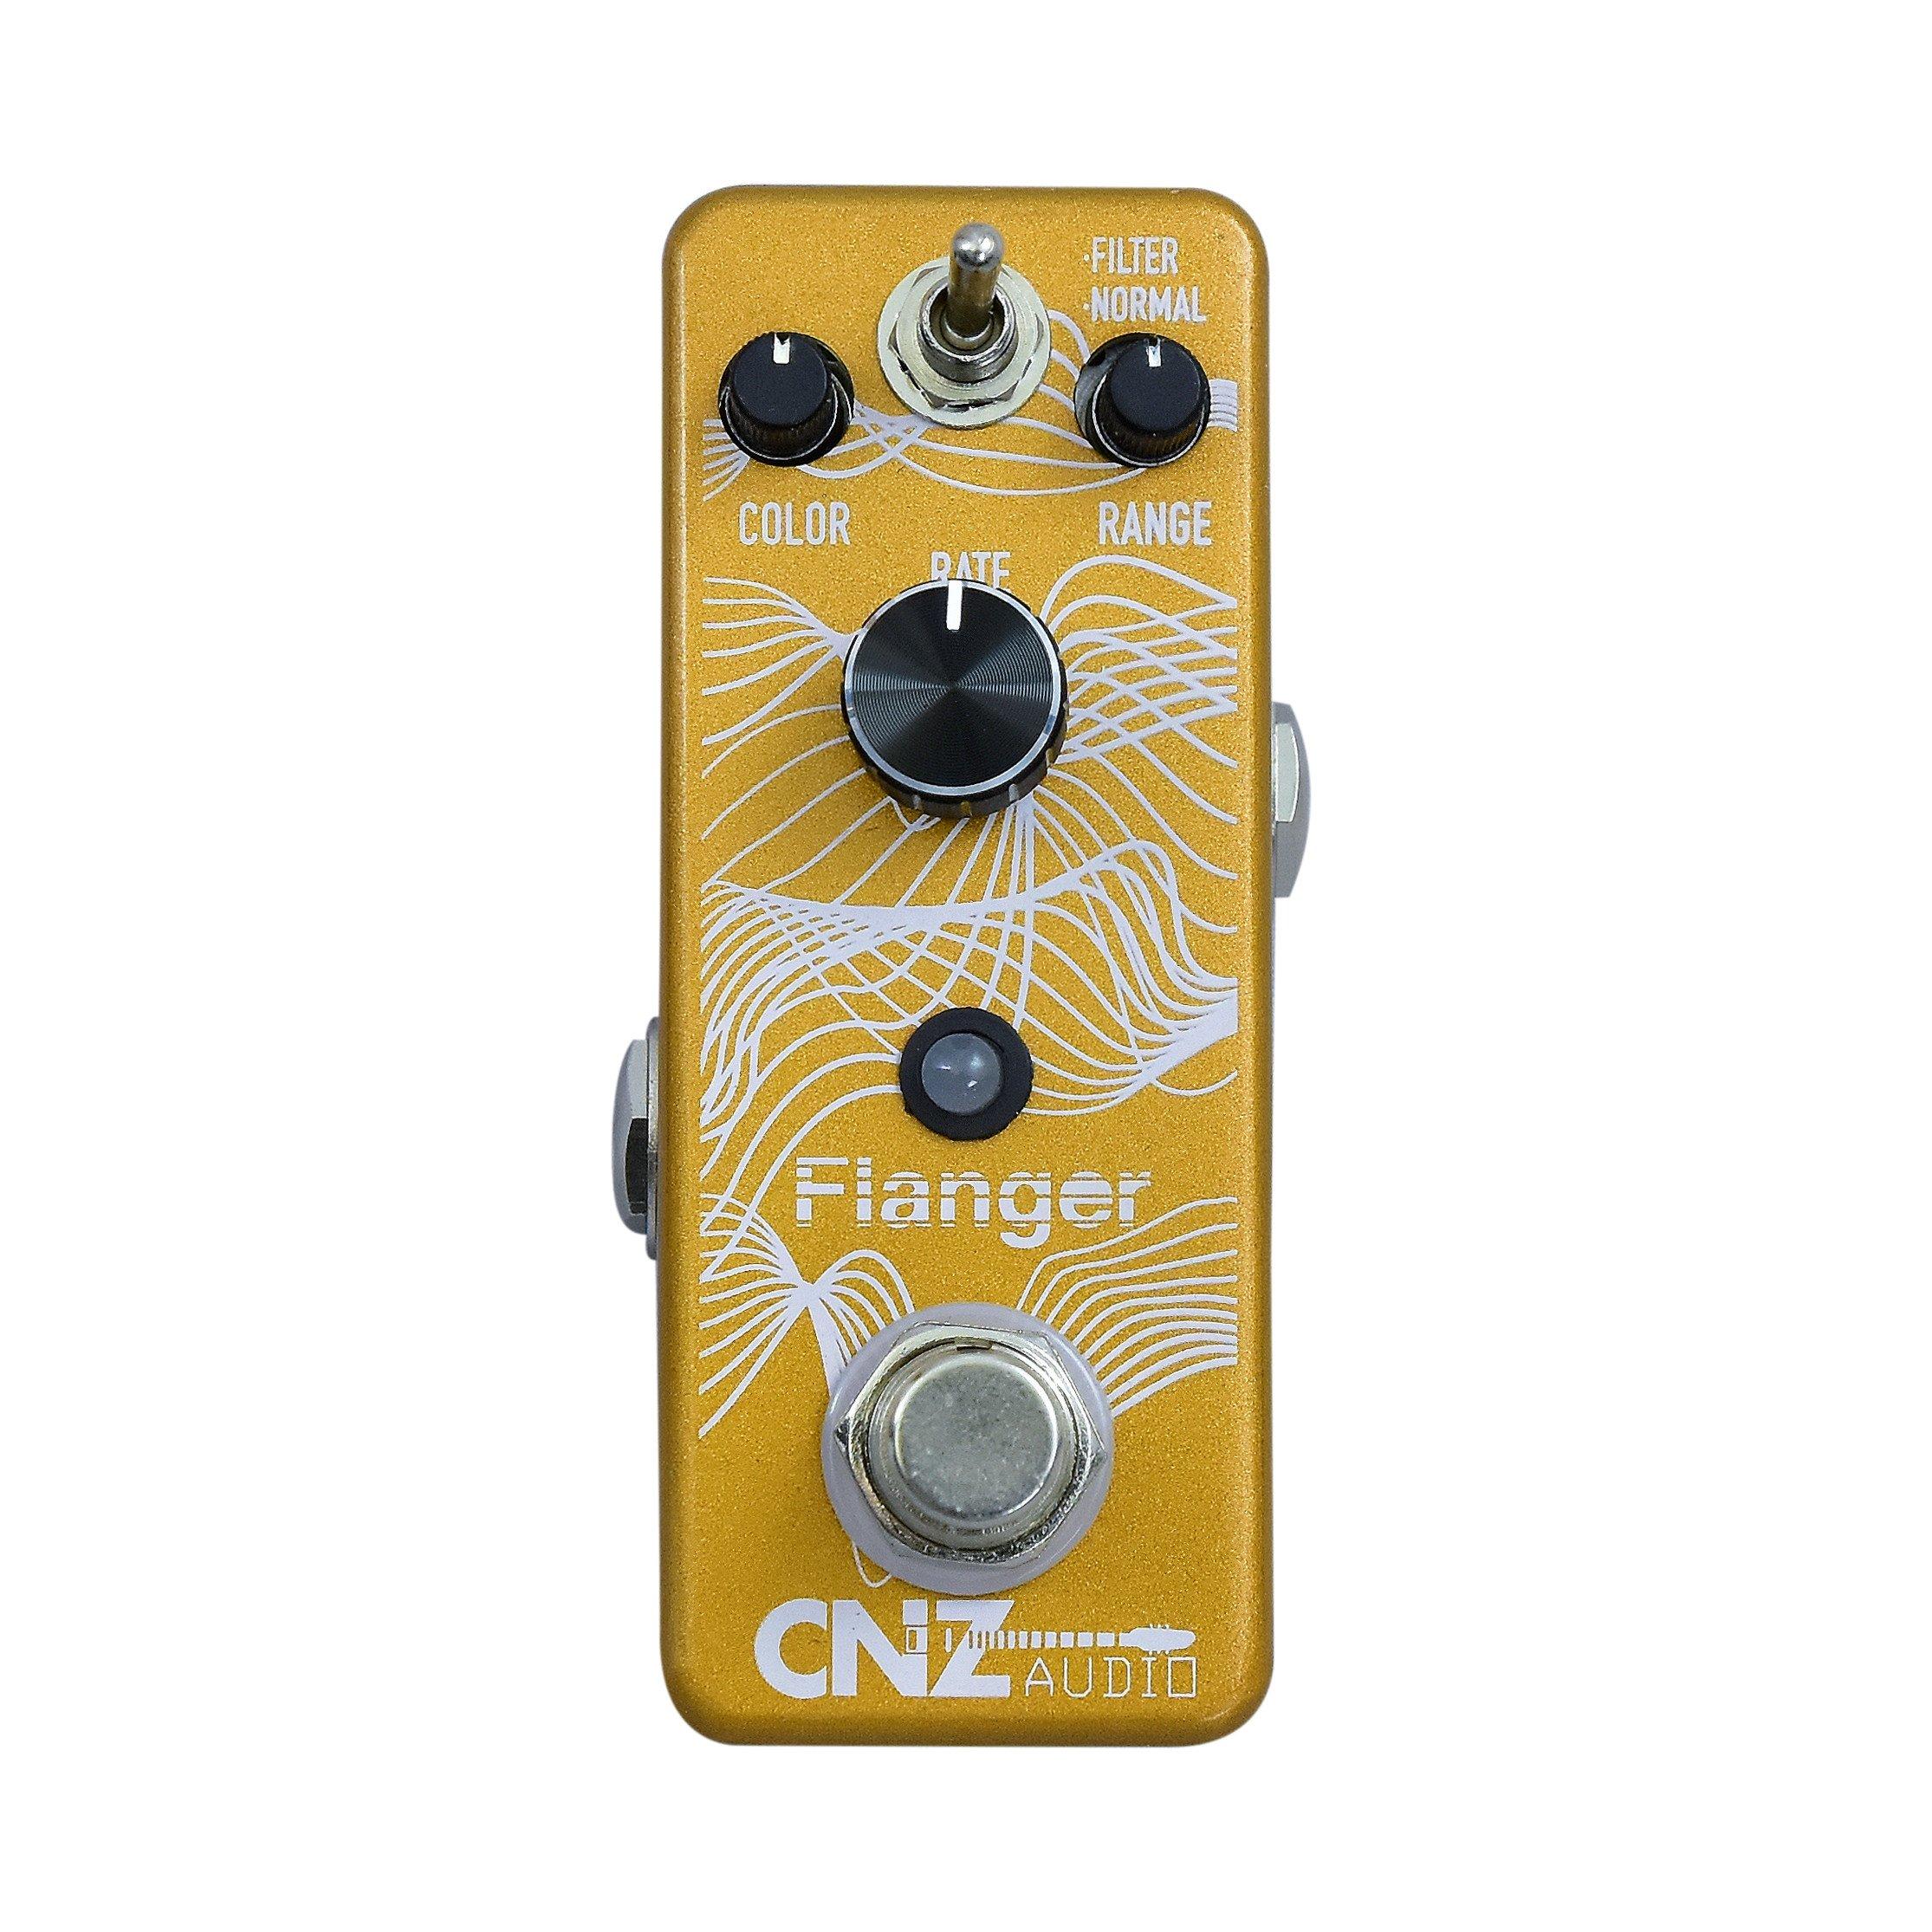 CNZ Audio Flanger - Guitar Effects Pedal